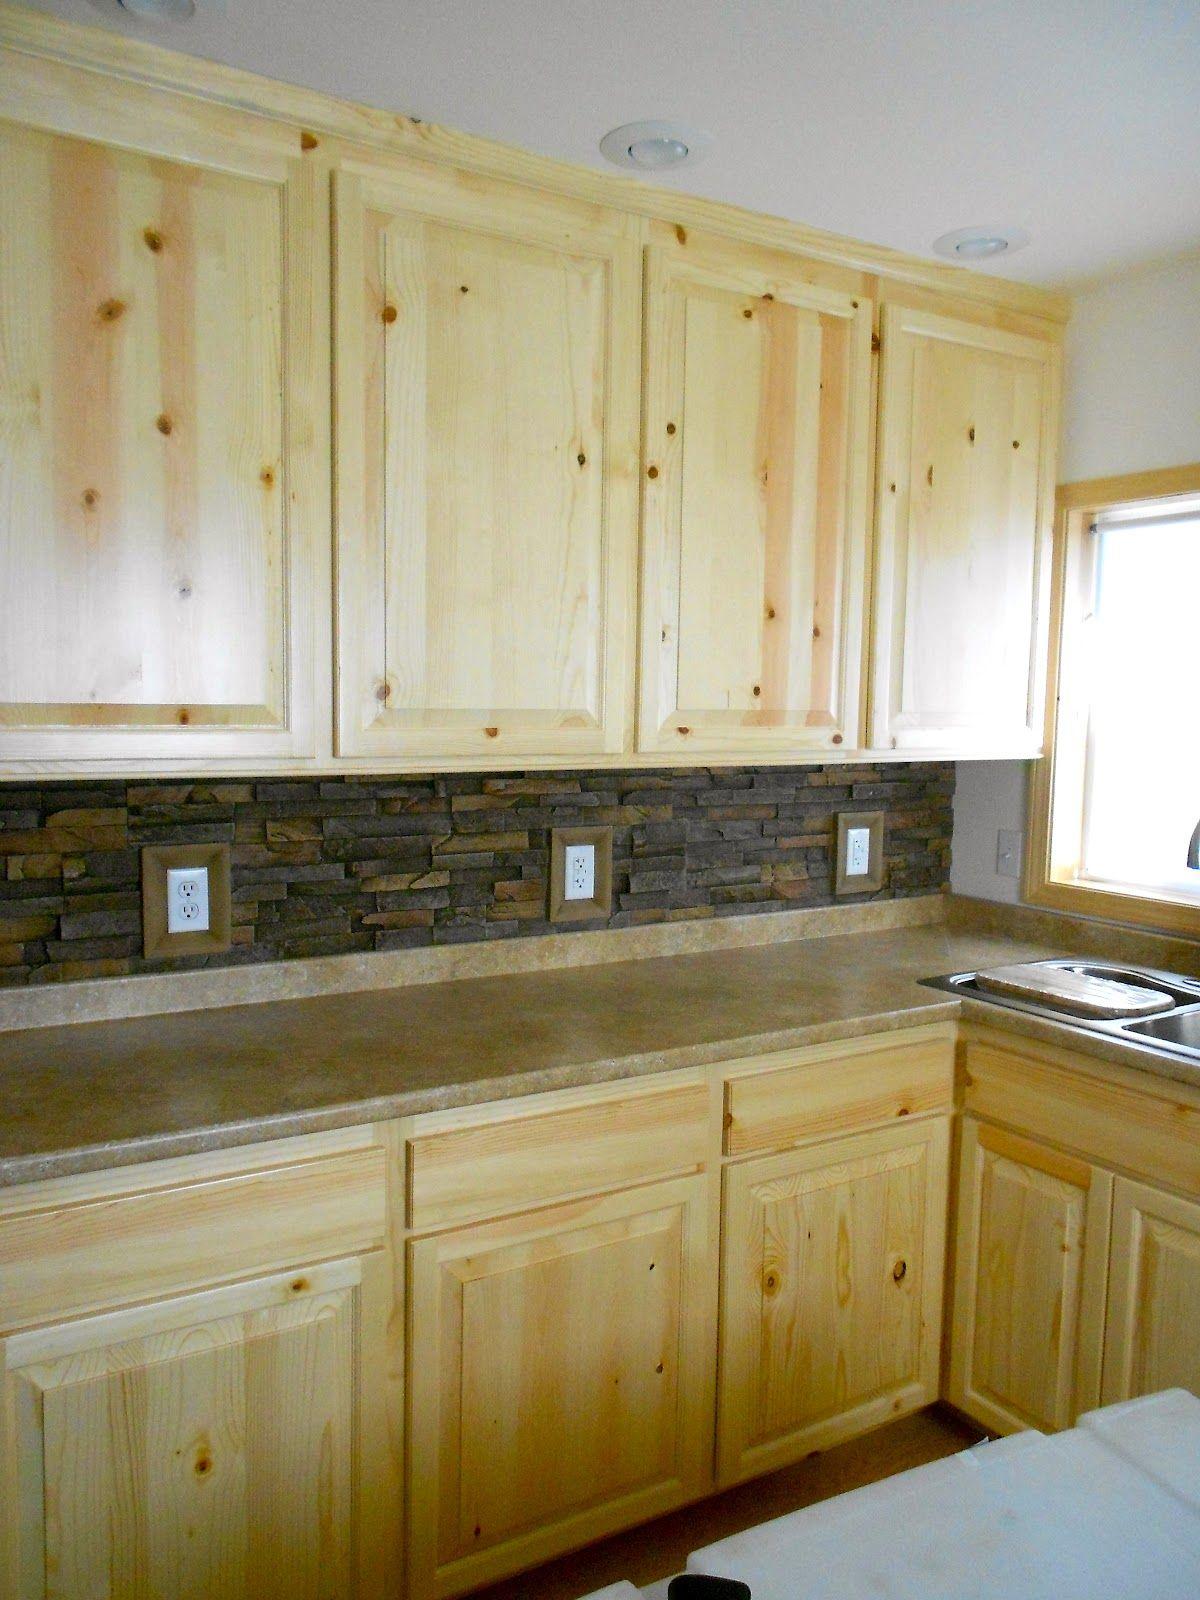 Want, pine kitchen cabinets | Knotty pine kitchen, Pine ...